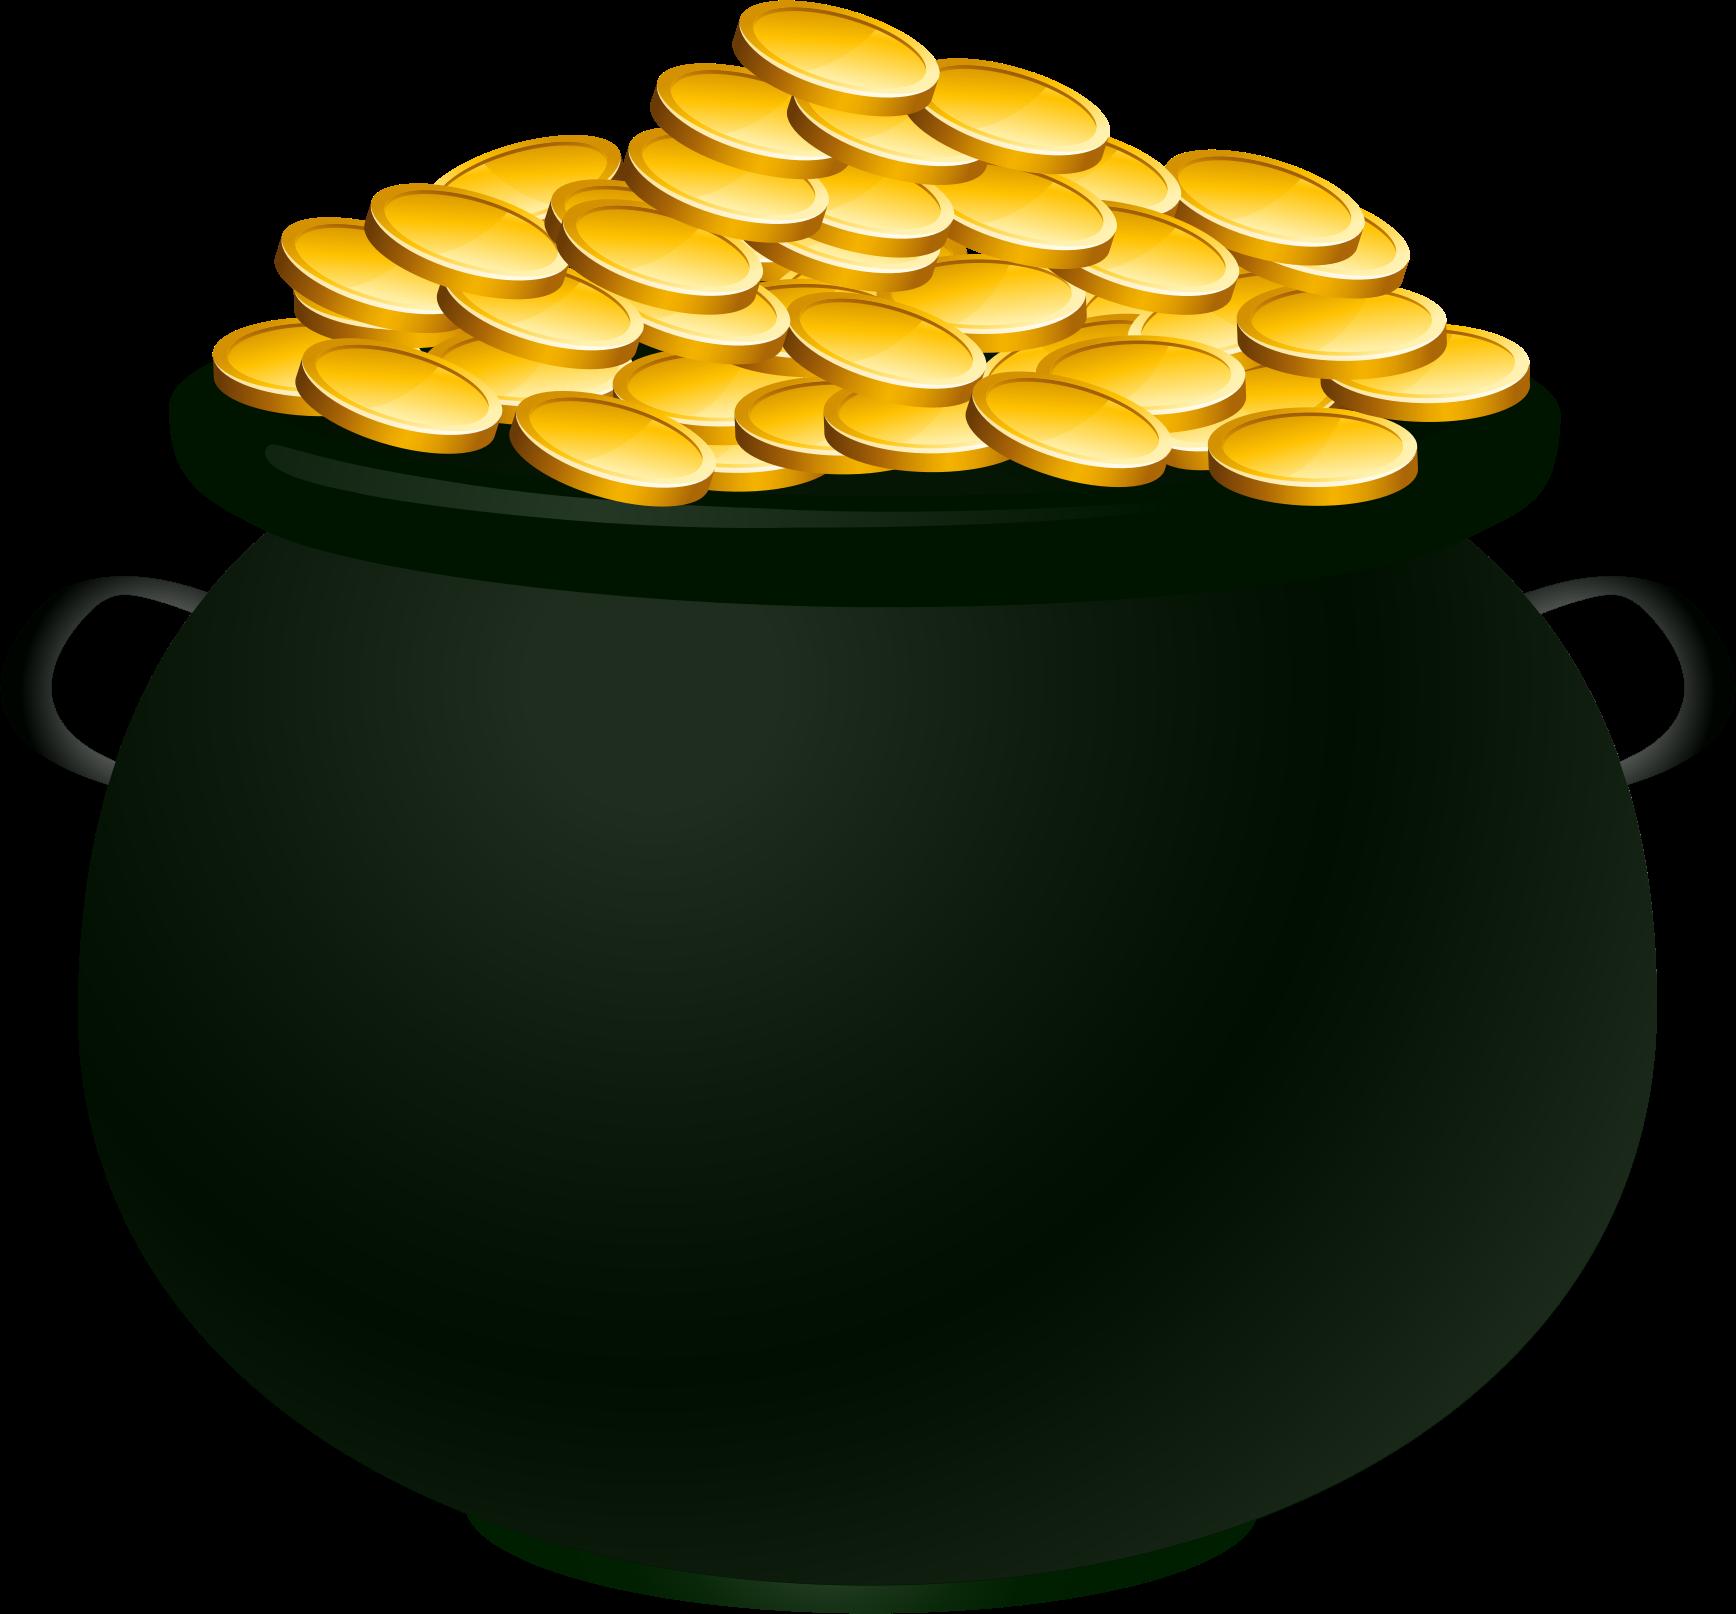 Clipart children pot graphic royalty free Pot of gold clipart clipart kid image #42127 graphic royalty free